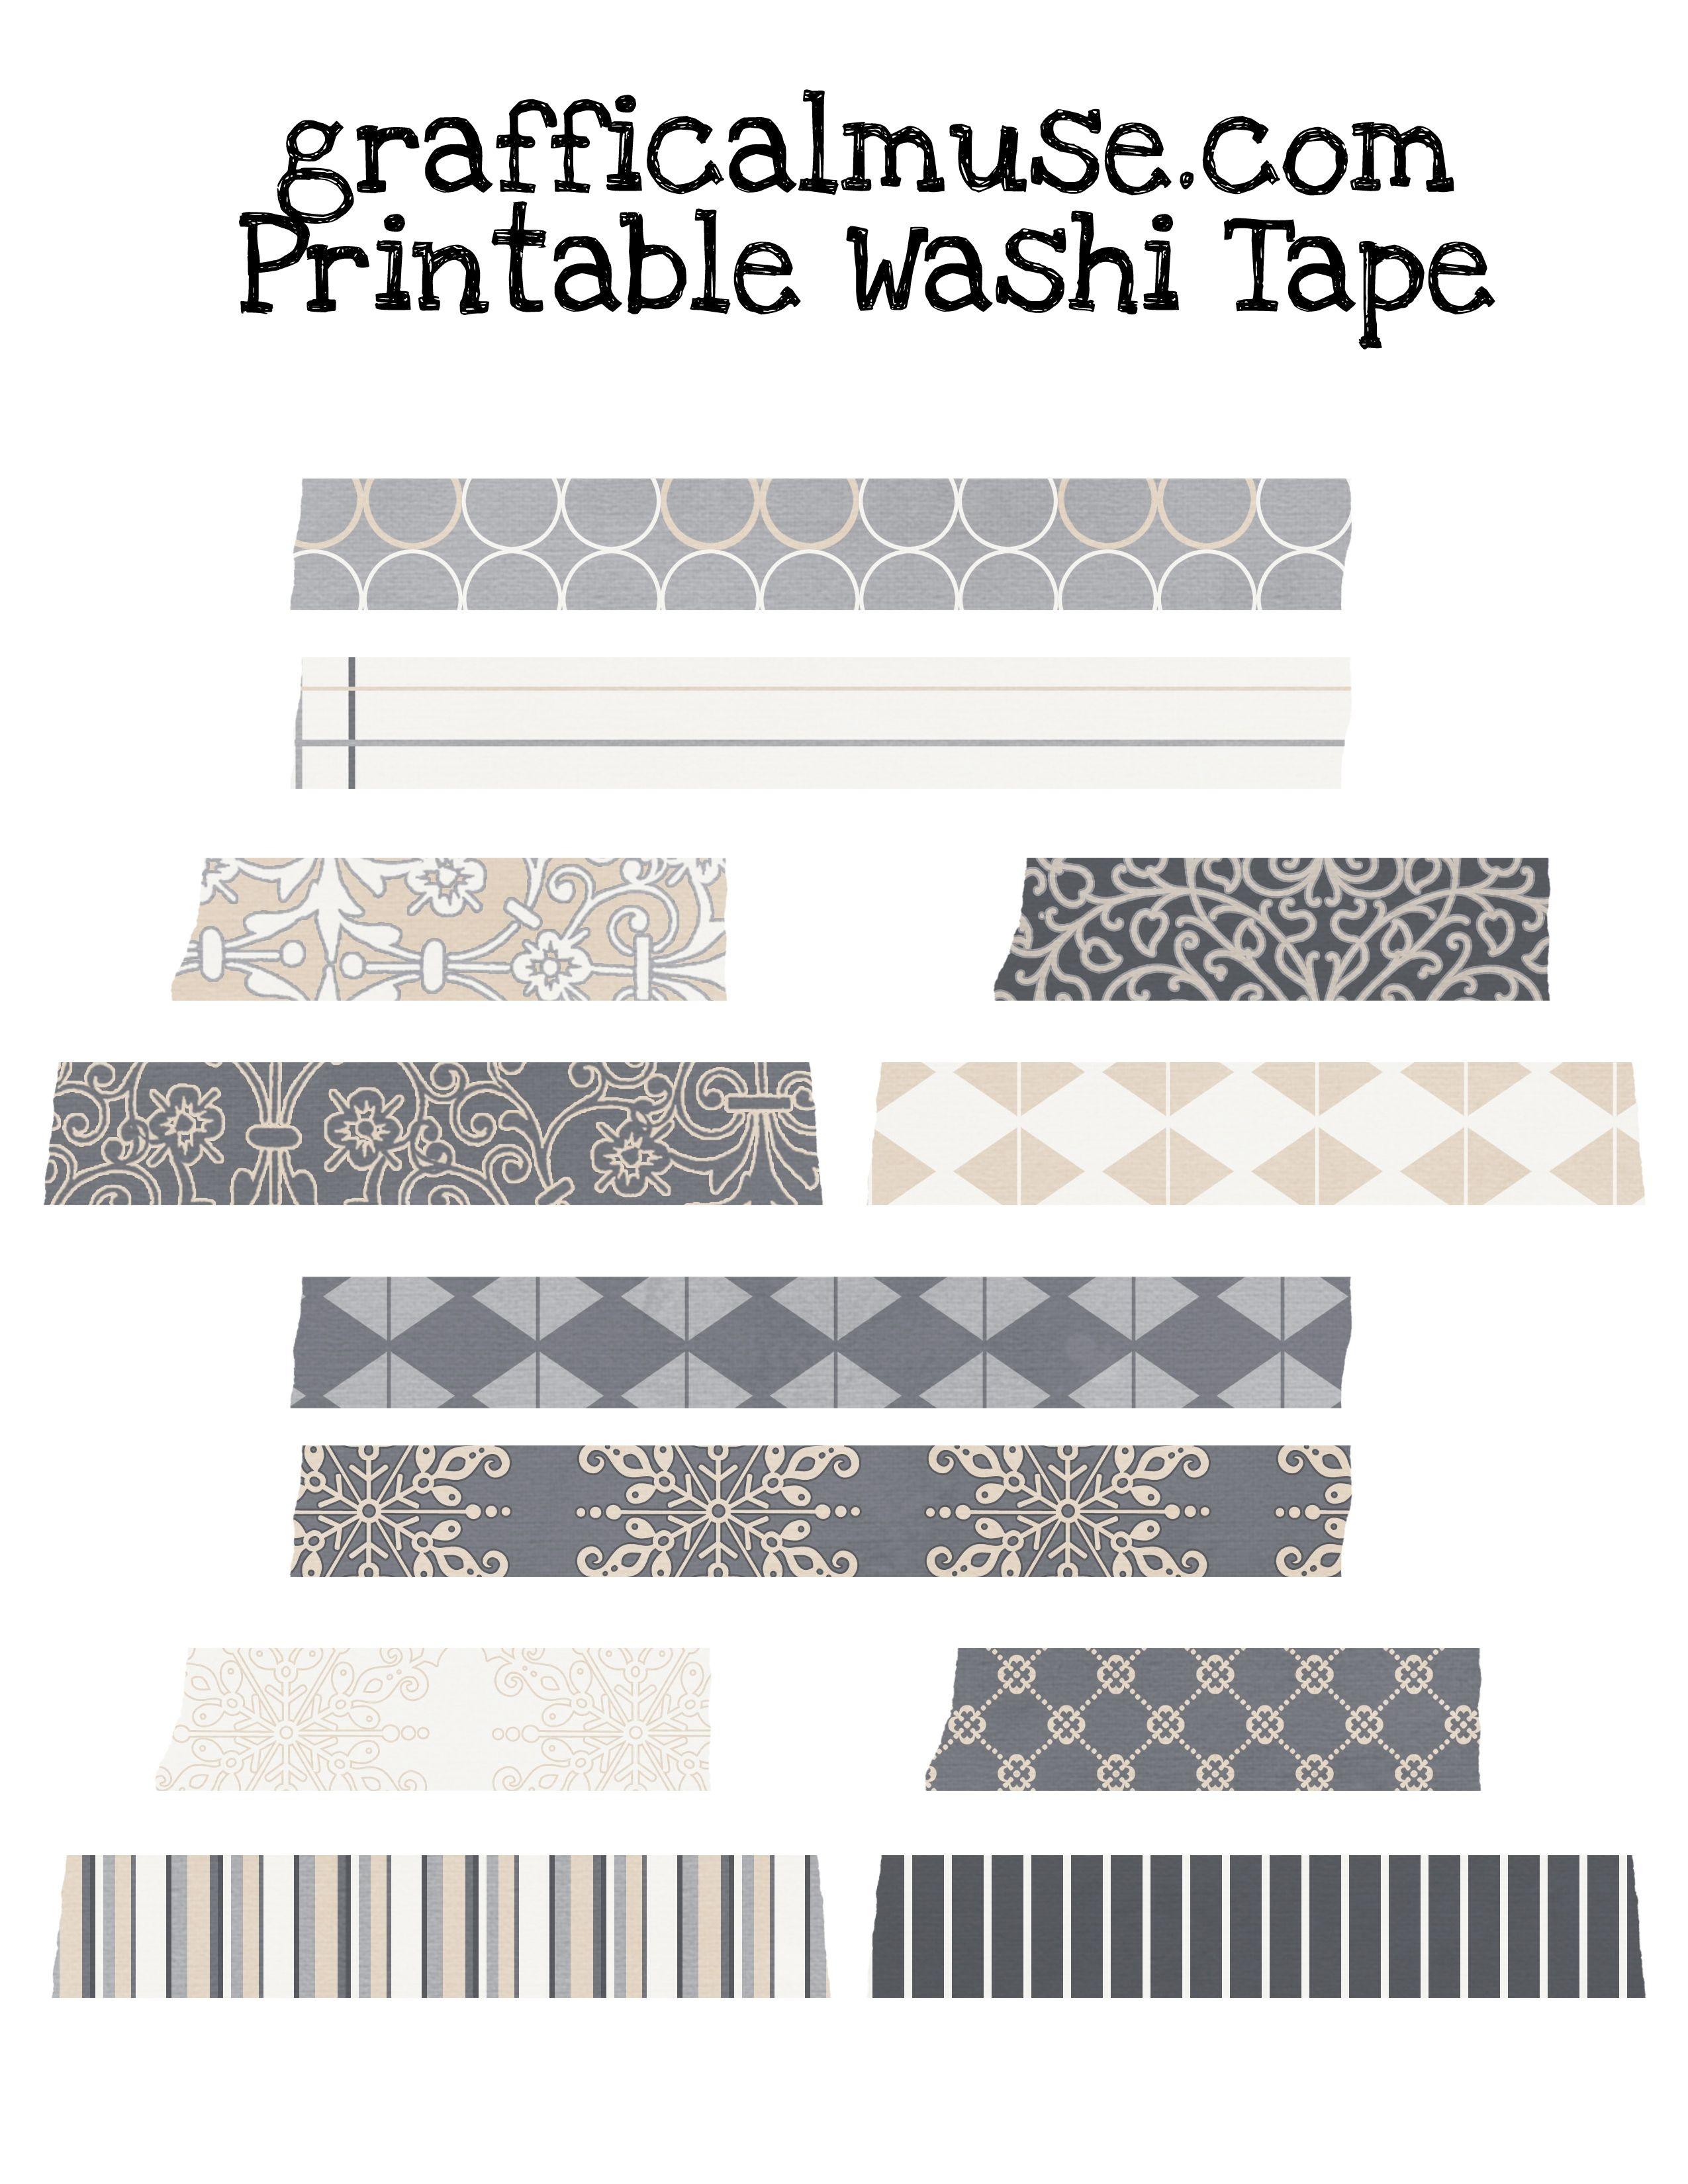 Free} Printable Washi Tape Neutral Patterns   Bullet Journal   Washi - Free Printable Washi Tape